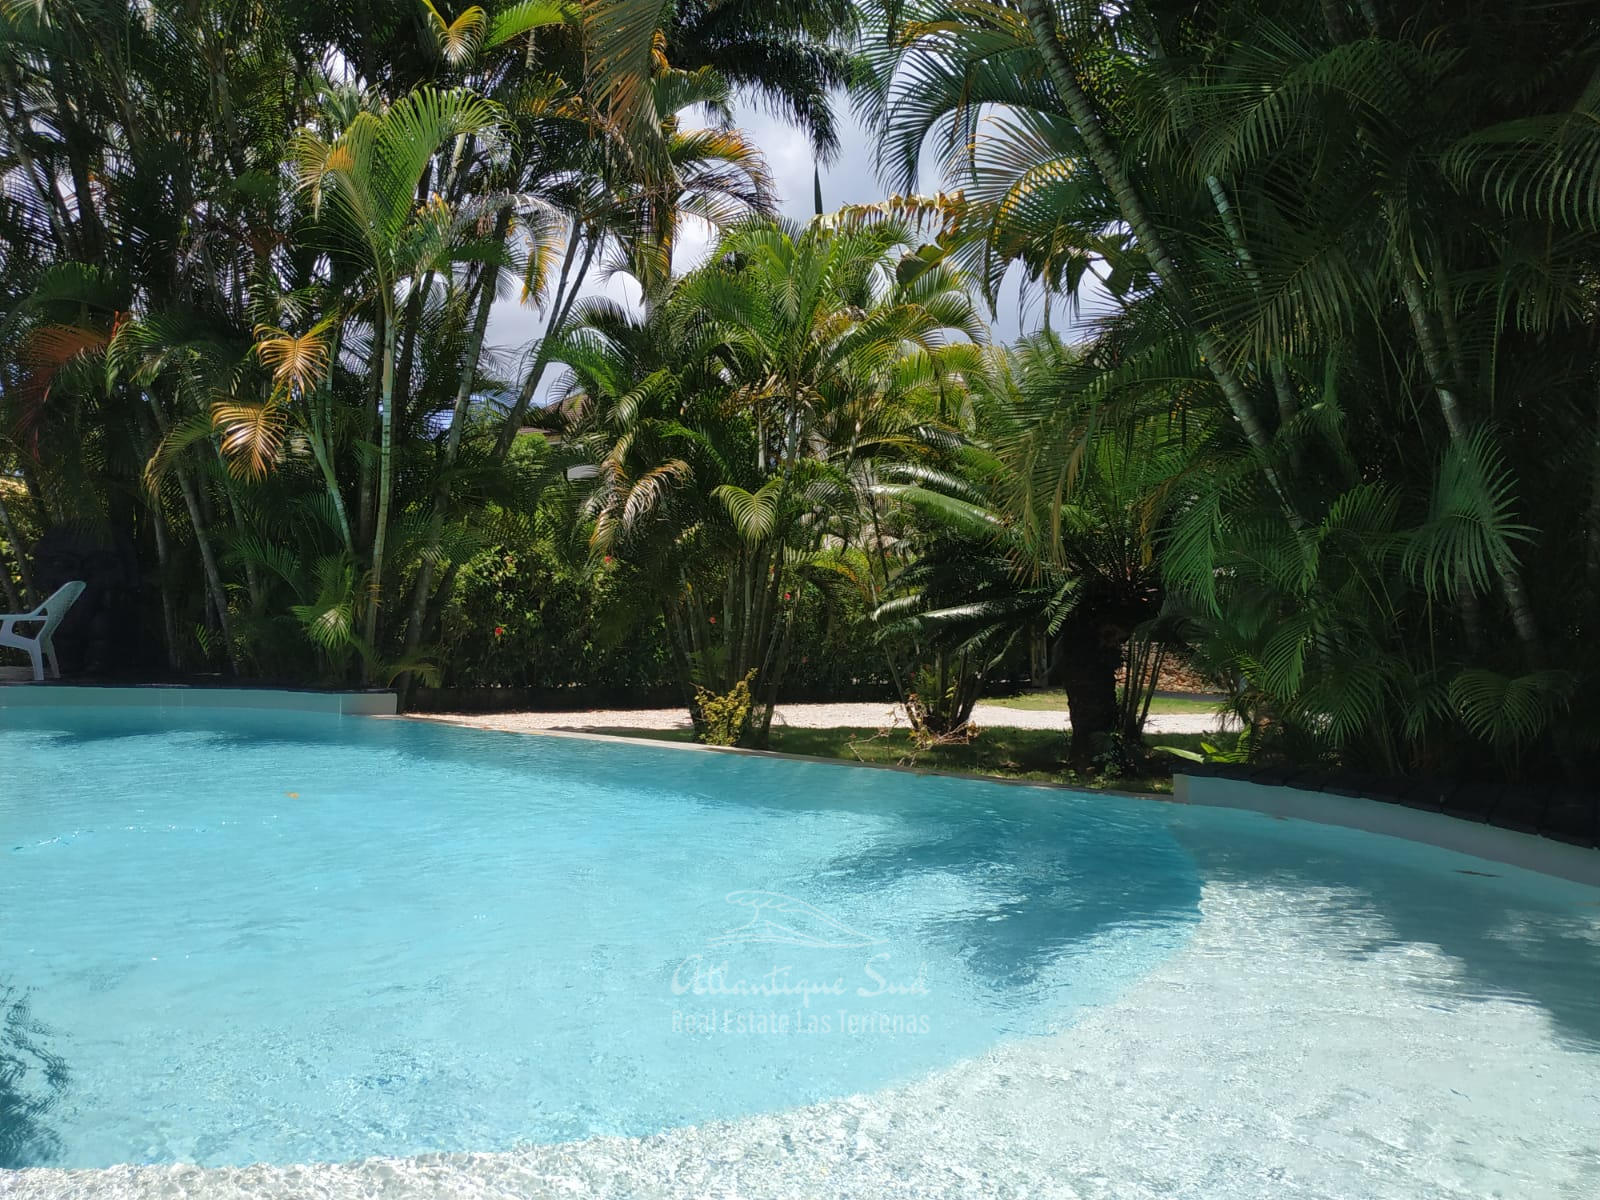 Villa Authentic Carribean Real Estate Las Terrenas Dominican Republic3.jpg